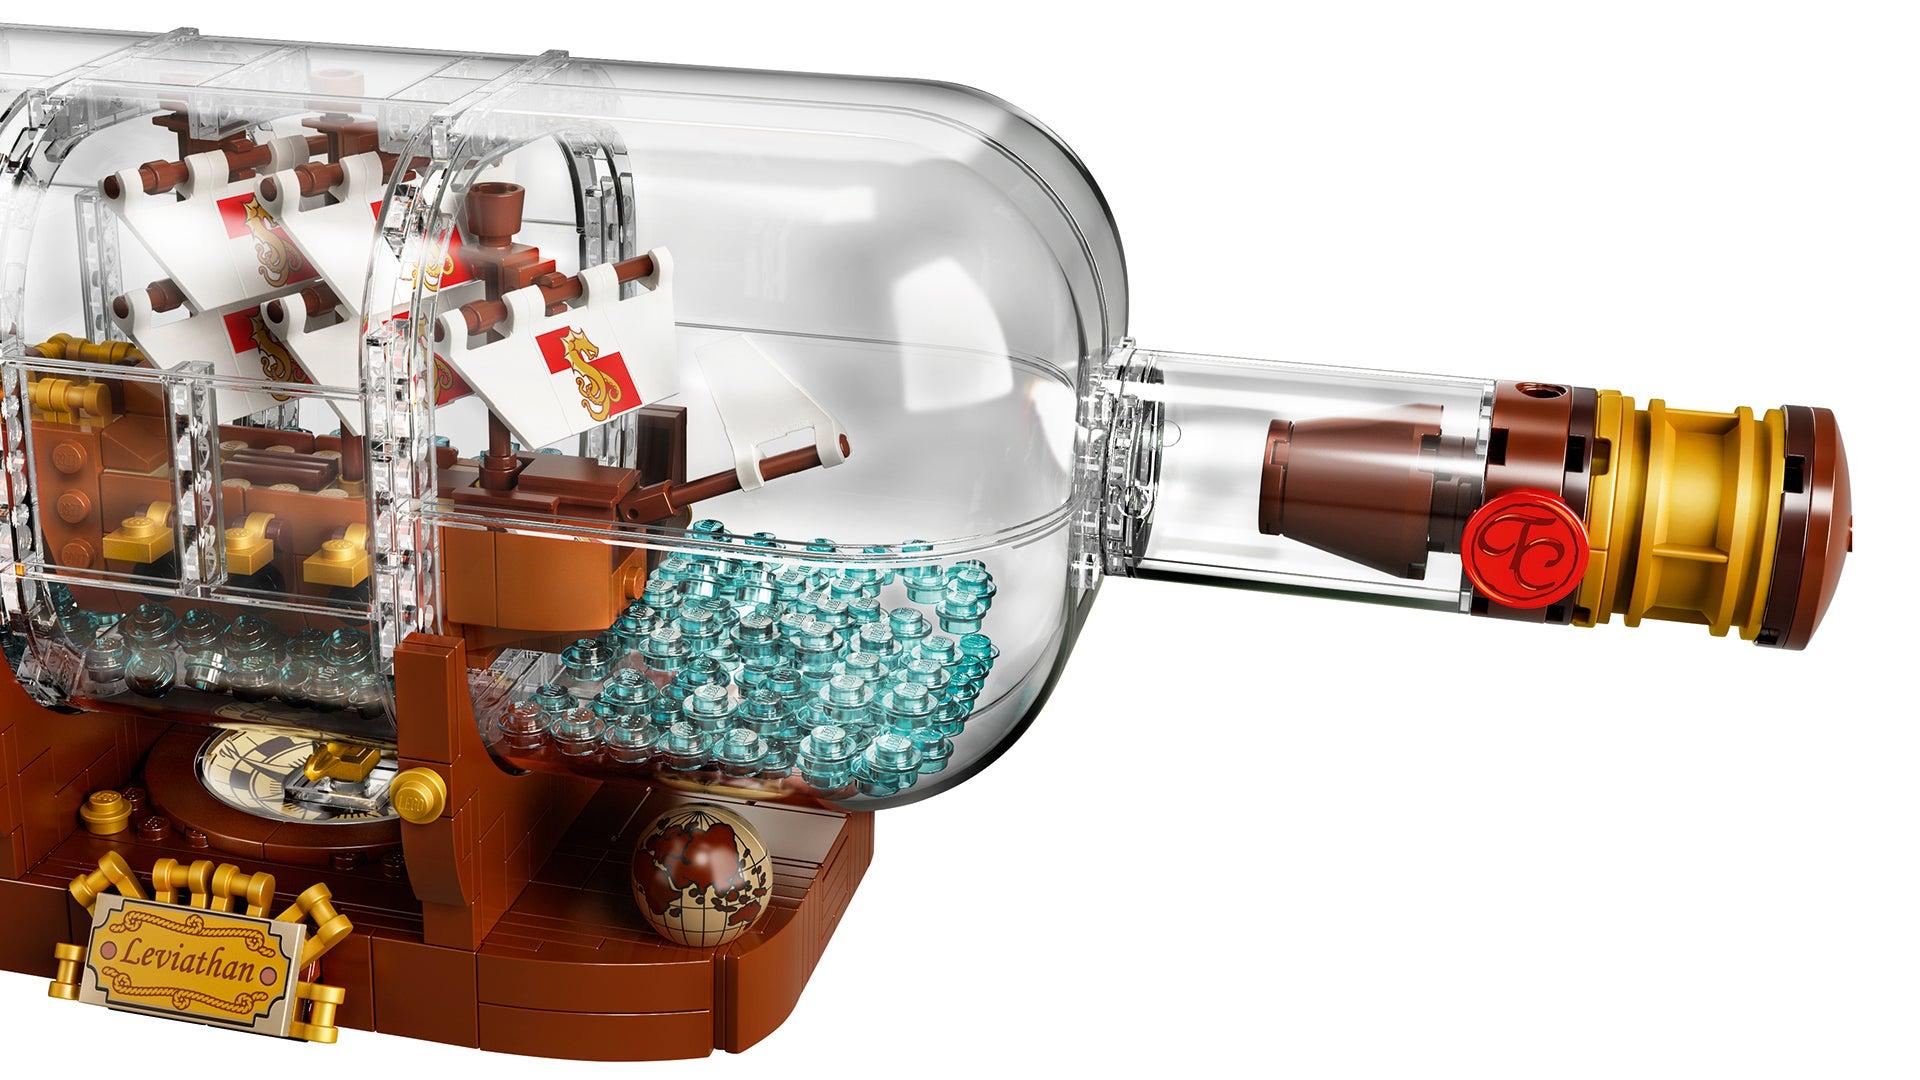 Building A Lego Ship In A Bottle Seems Pretty Easy